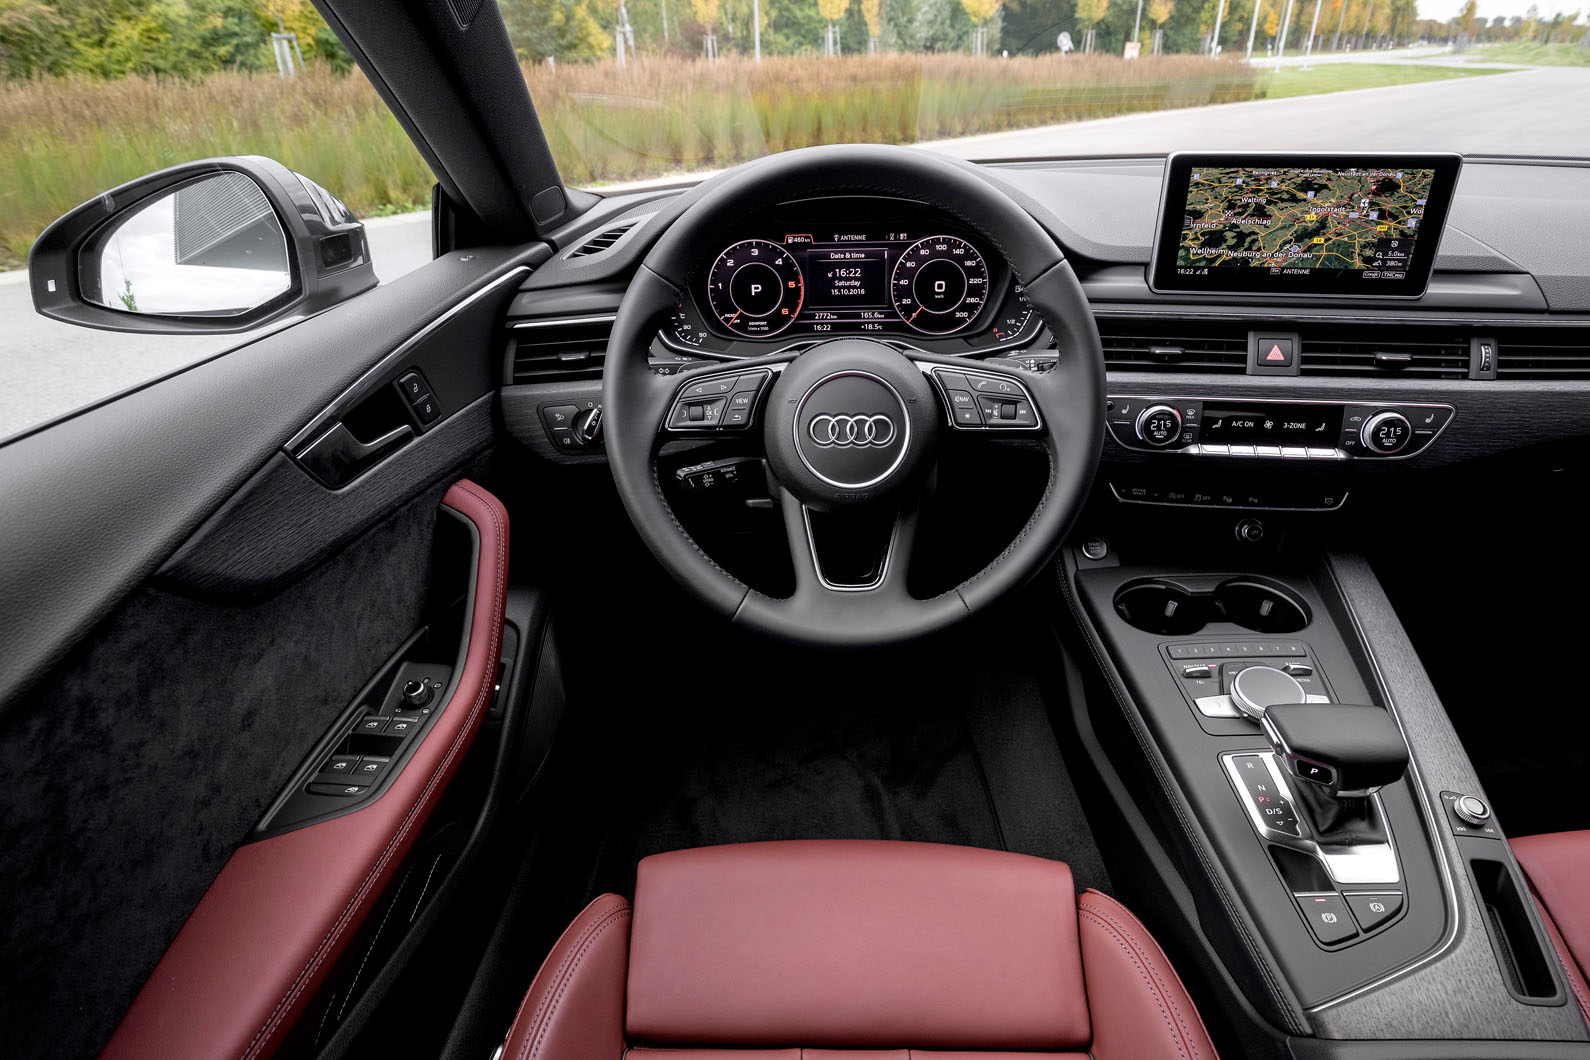 2017 Audi A5 Sportback 30 Tdi 286 Quattro S Line Review Review